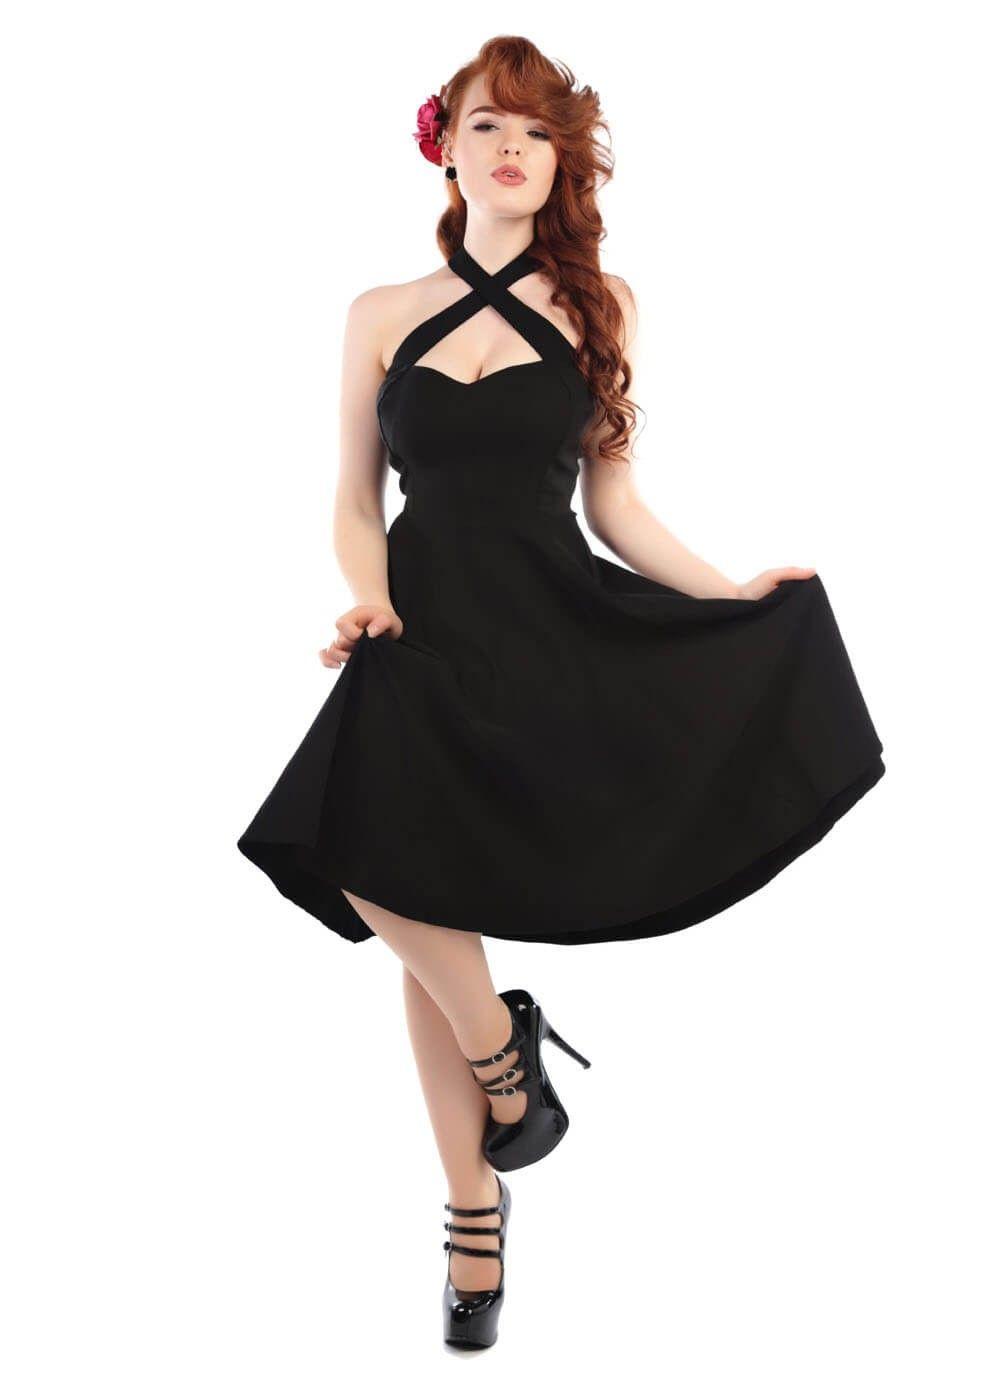 Collectif Penny Flared Dress Black Rockabilly Swing Dress Vintage Flare Dress Vintage Dresses [ 1400 x 1000 Pixel ]